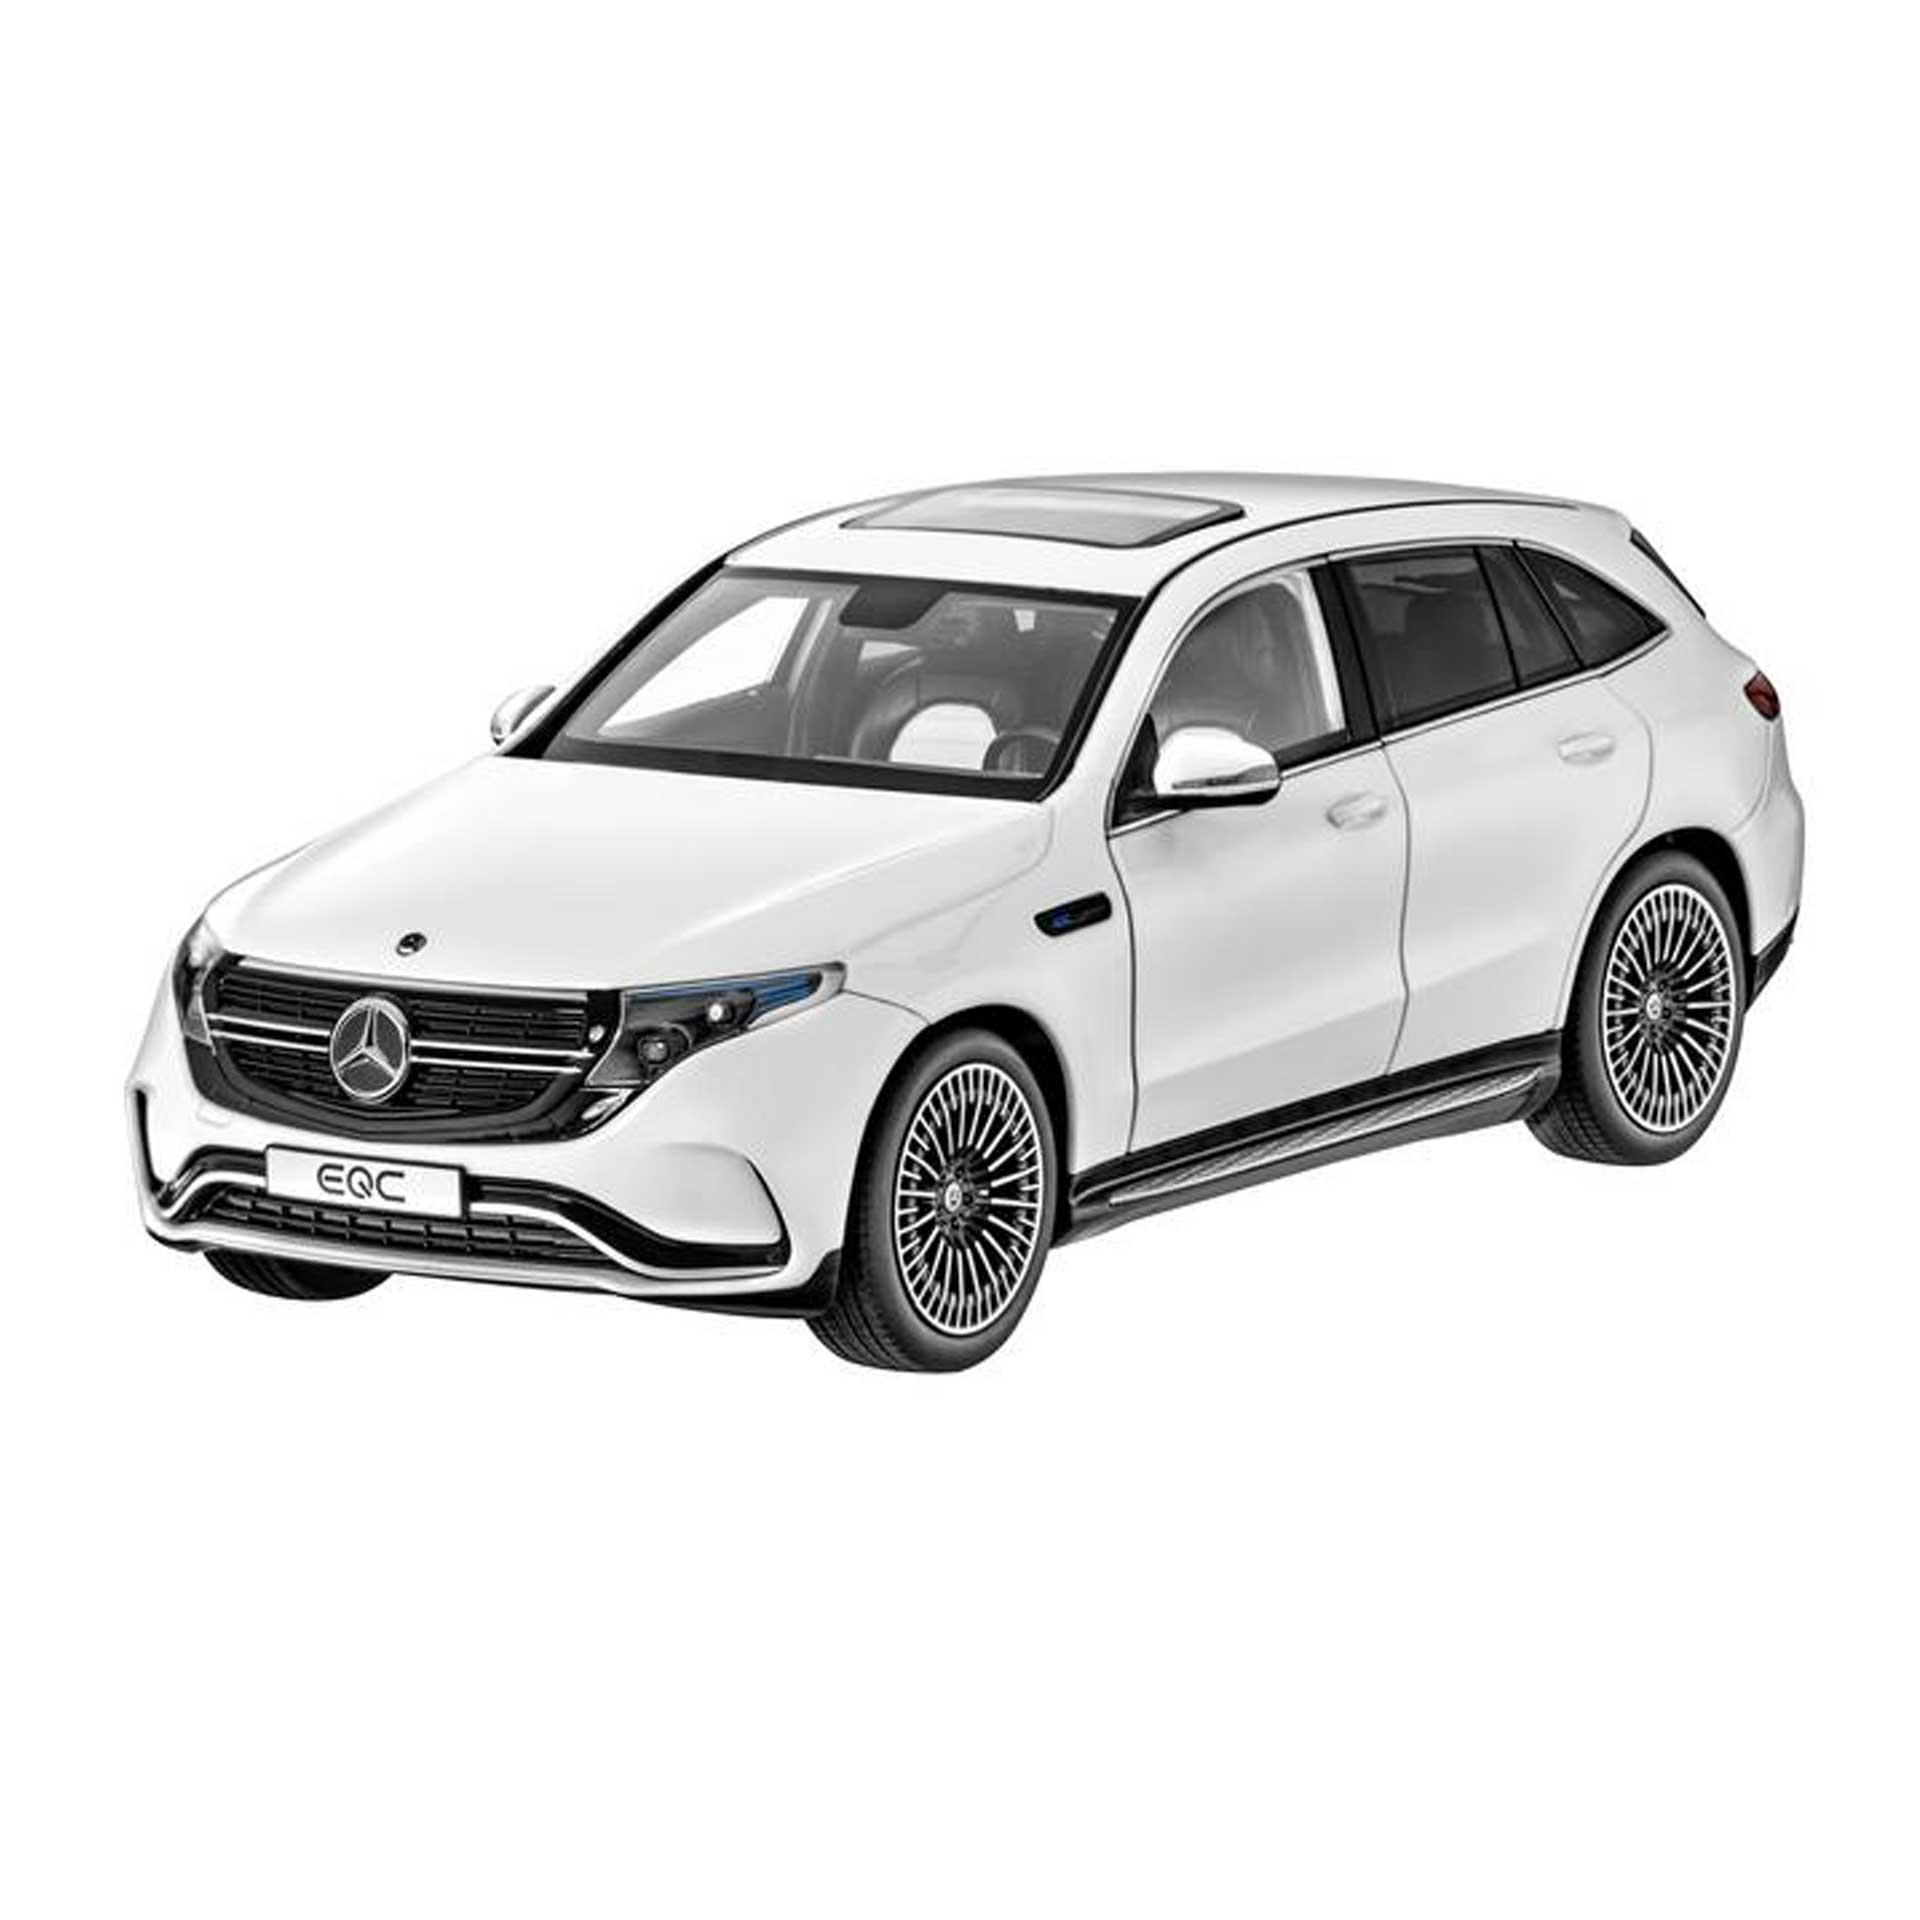 Mercedes-Benz Modellauto EQC N293 1:18 designo diamantweiß bright